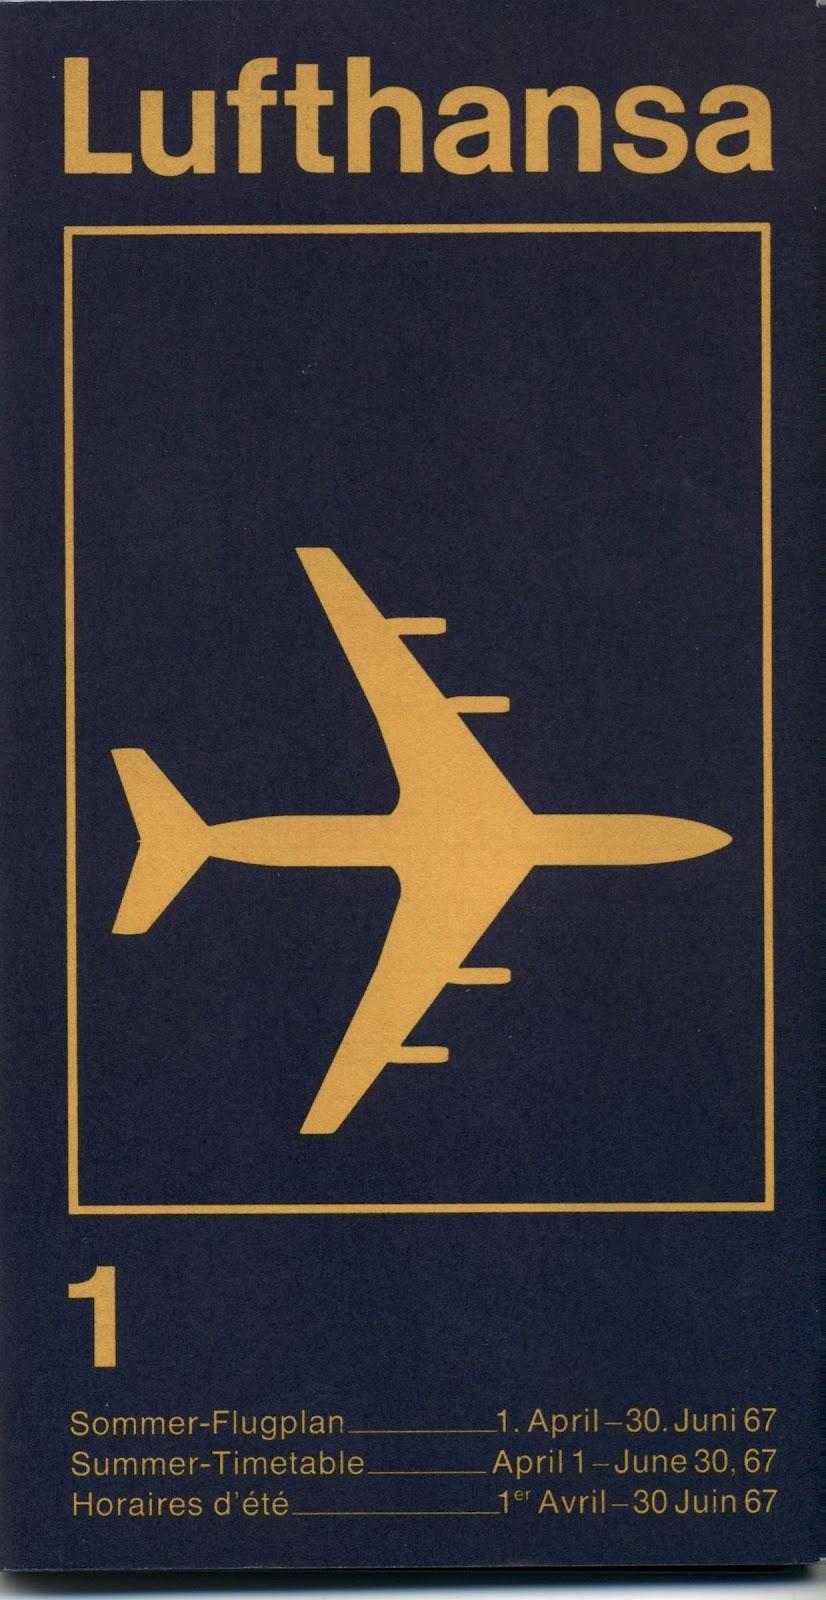 Pin by René Sánchez on Otl Aicher Vintage airline